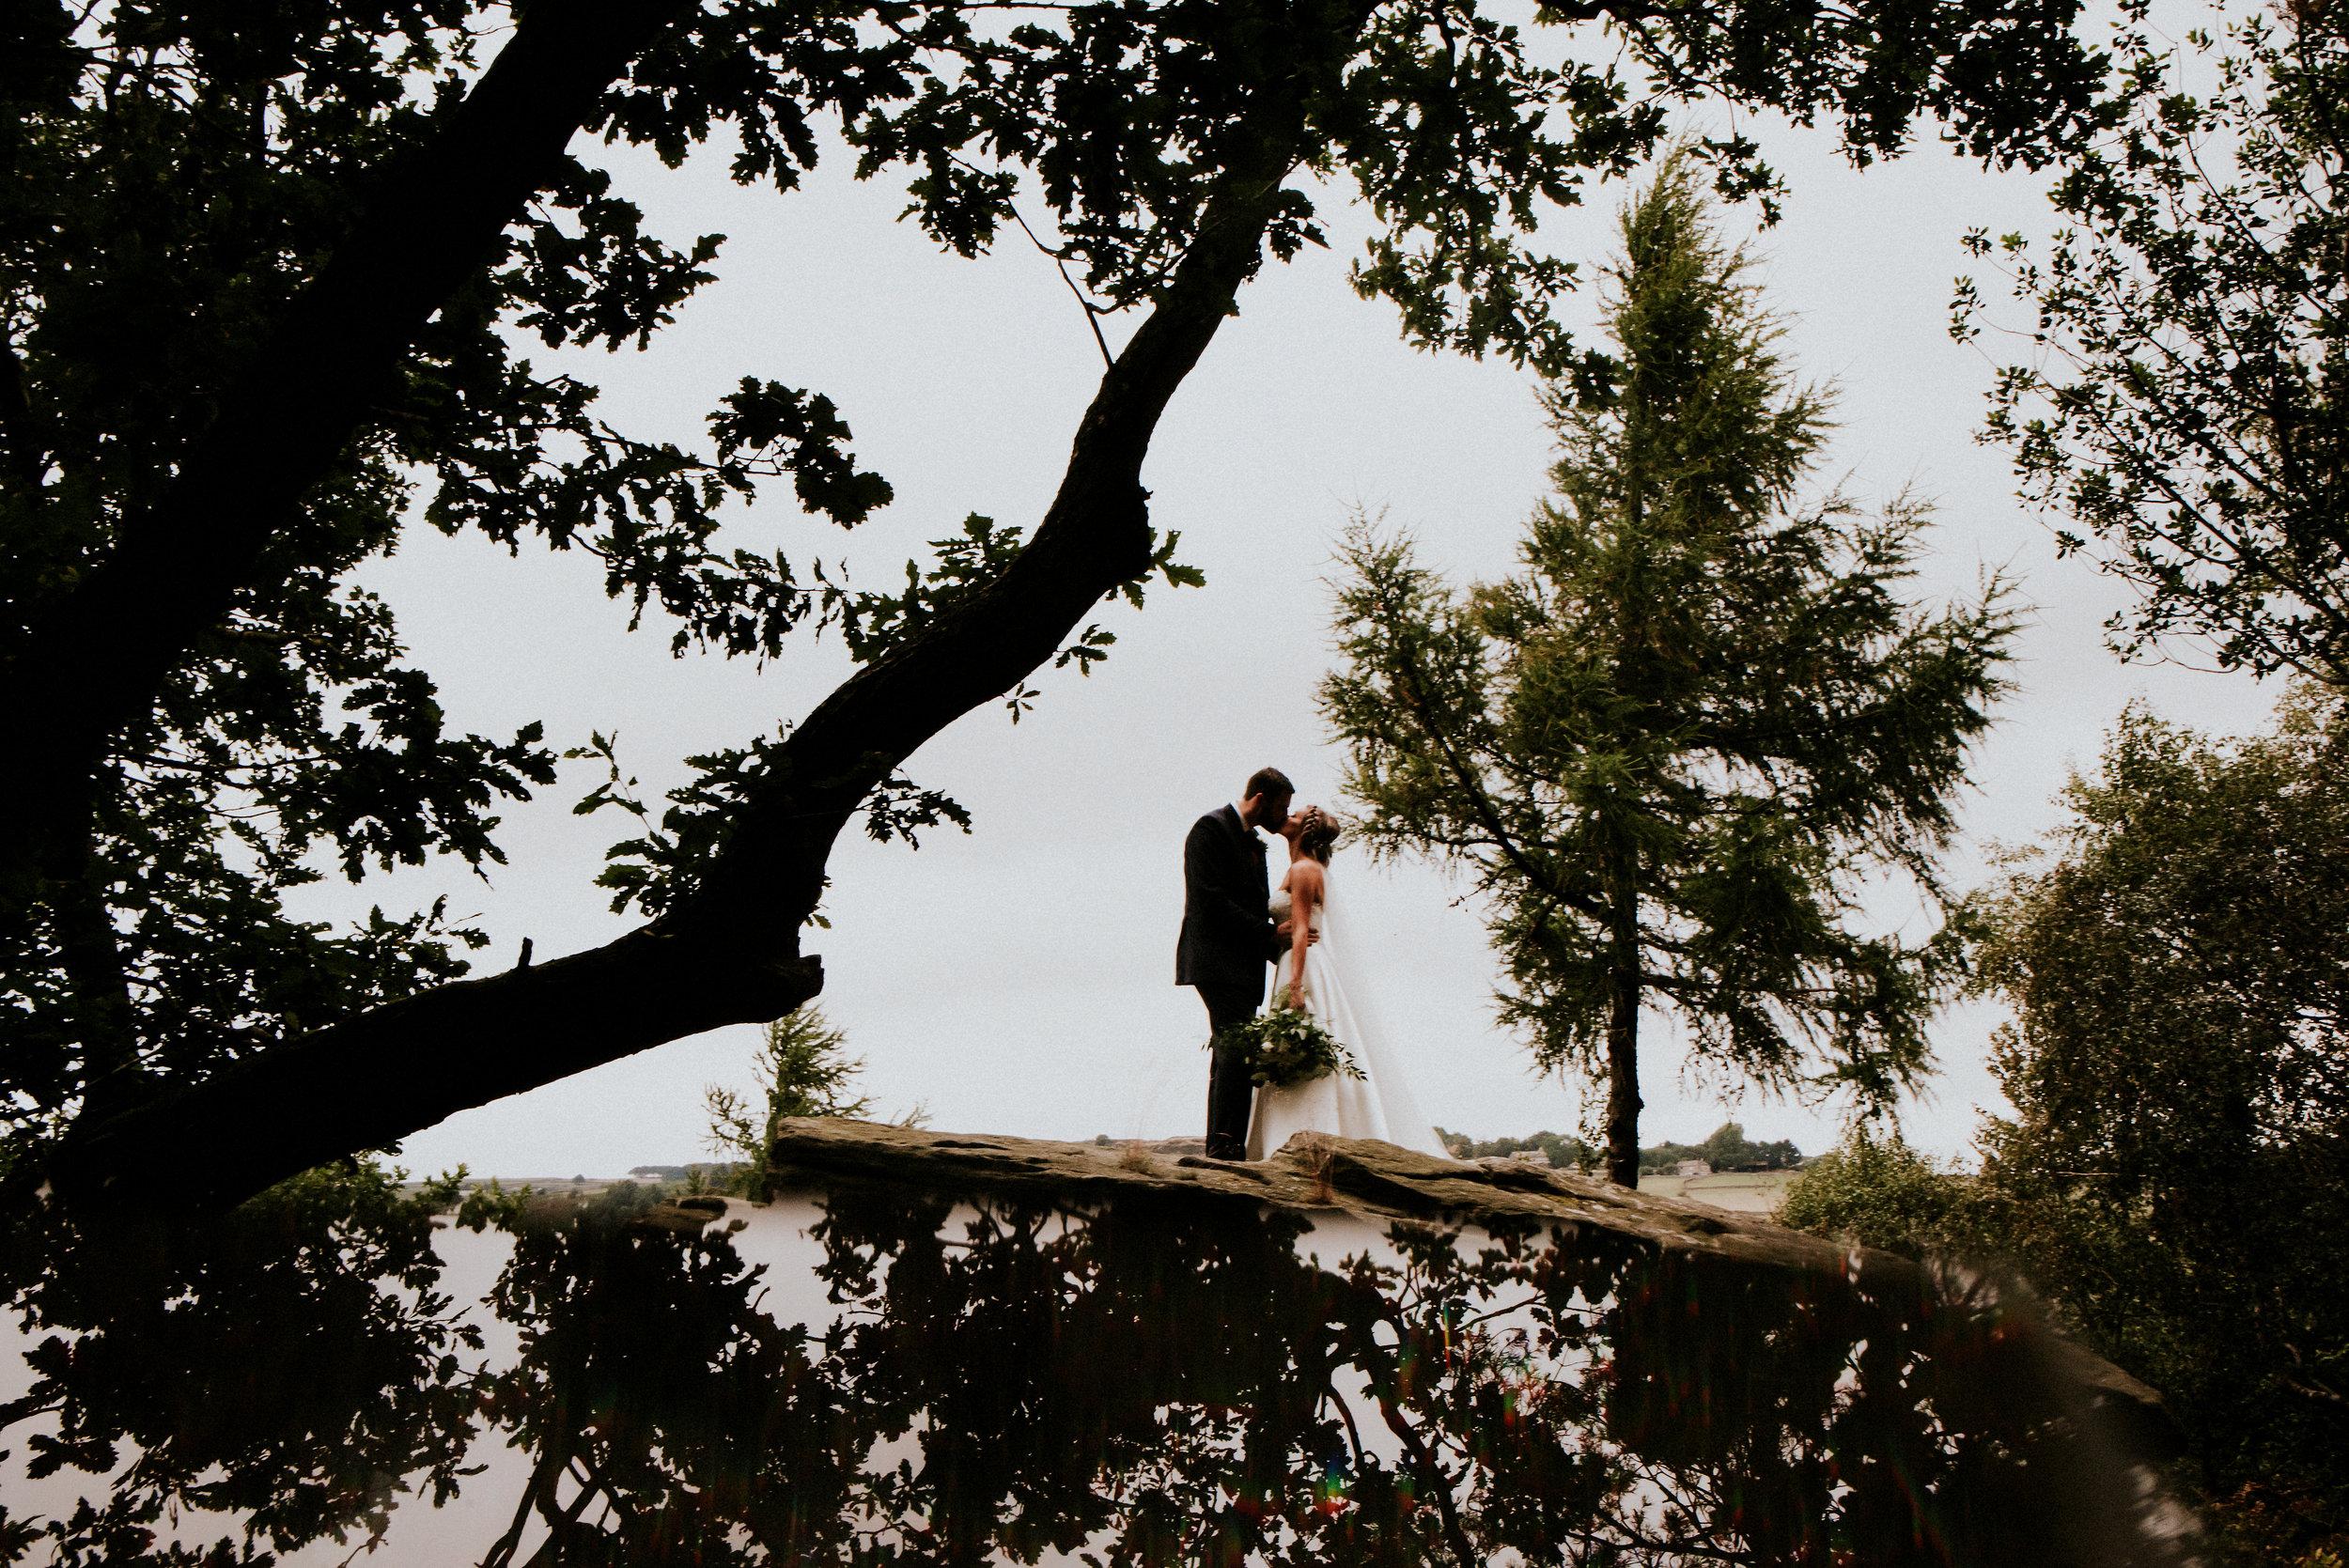 Brimham-Rocks-Summerbridge-Outdoor-Teep-Wedding-In-the-Woods-Shutter-Go-Click-77.jpg